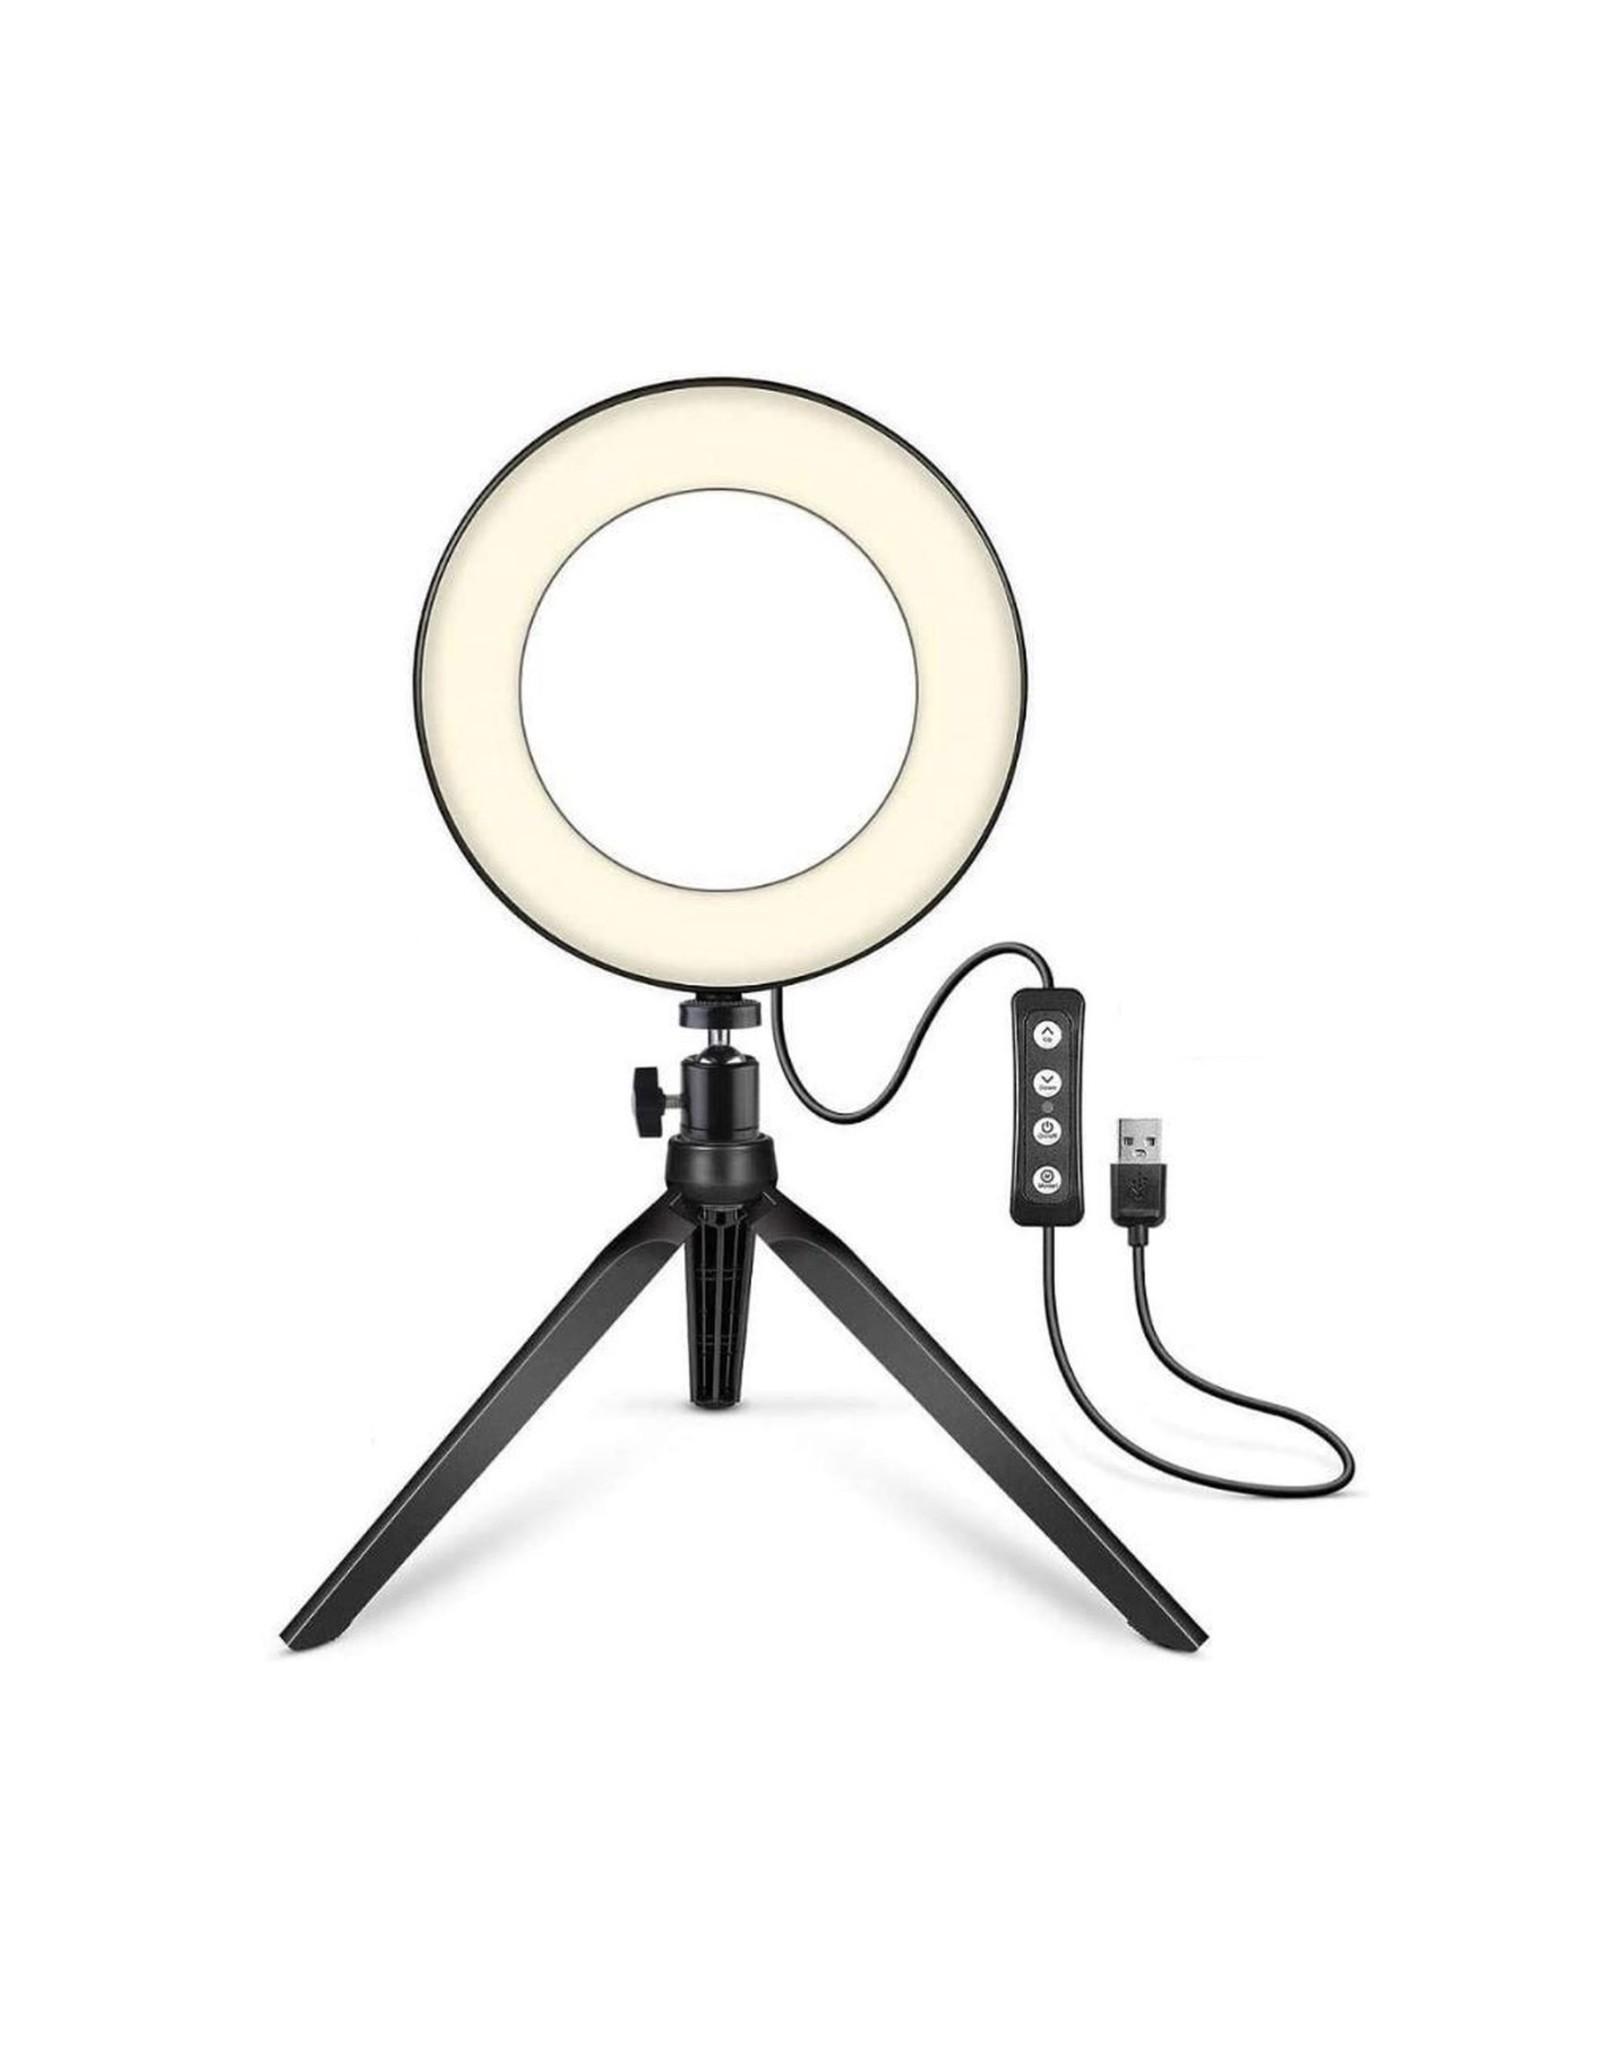 Parya Official Parya Official - LED Ringlight - Met Telefoonhouder - 40 cm